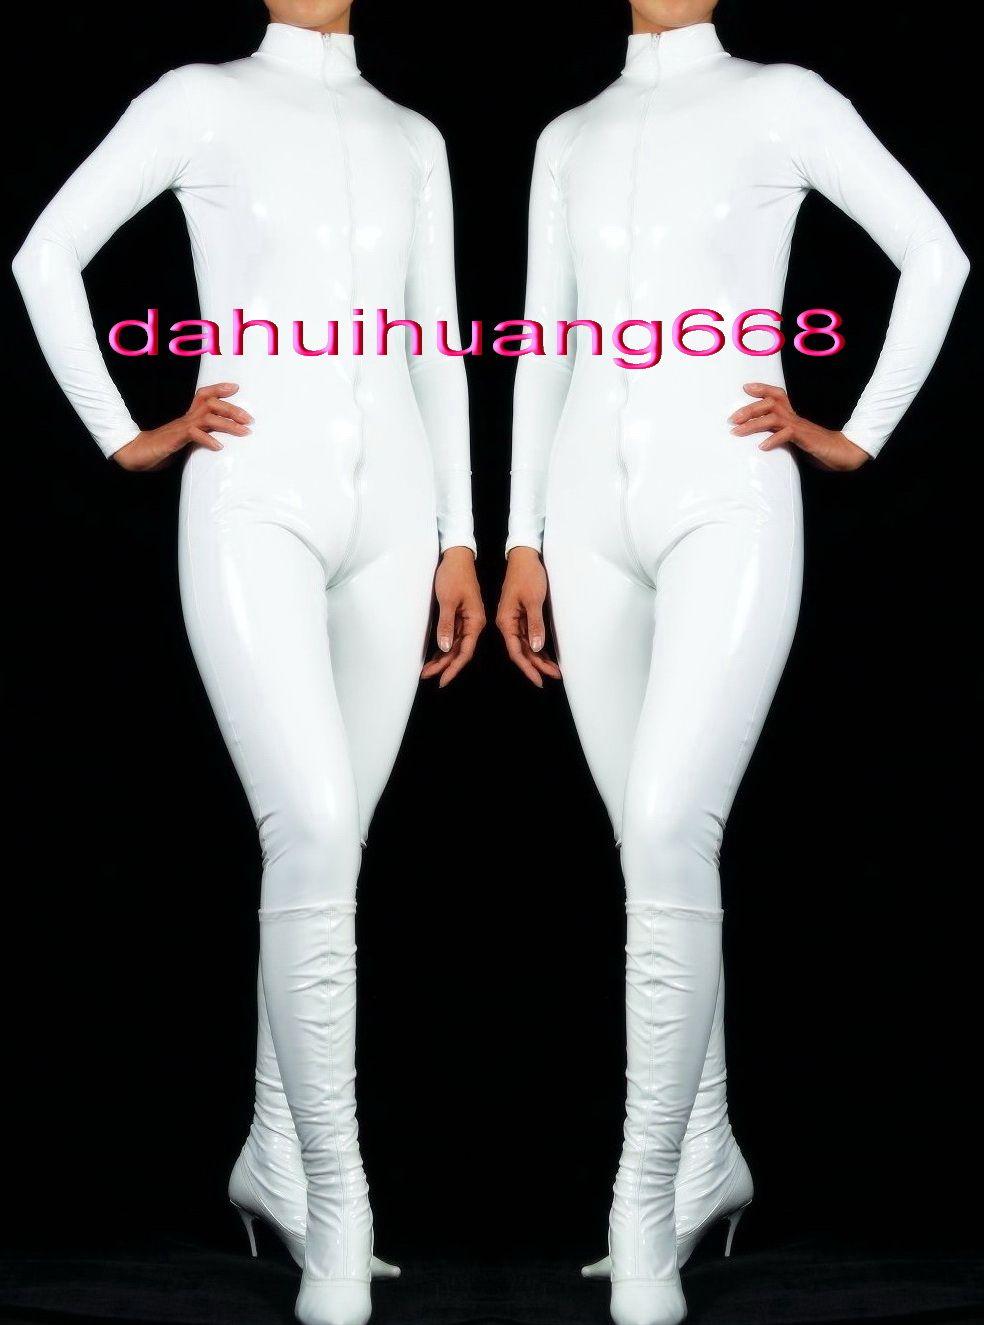 New Shiny White PVC Suit Catsuit Costumes Unisex Sexy PVC Bodysuit leotard Costumes Unisex White PVC Body Suit Costumes Front Long Zip DH187